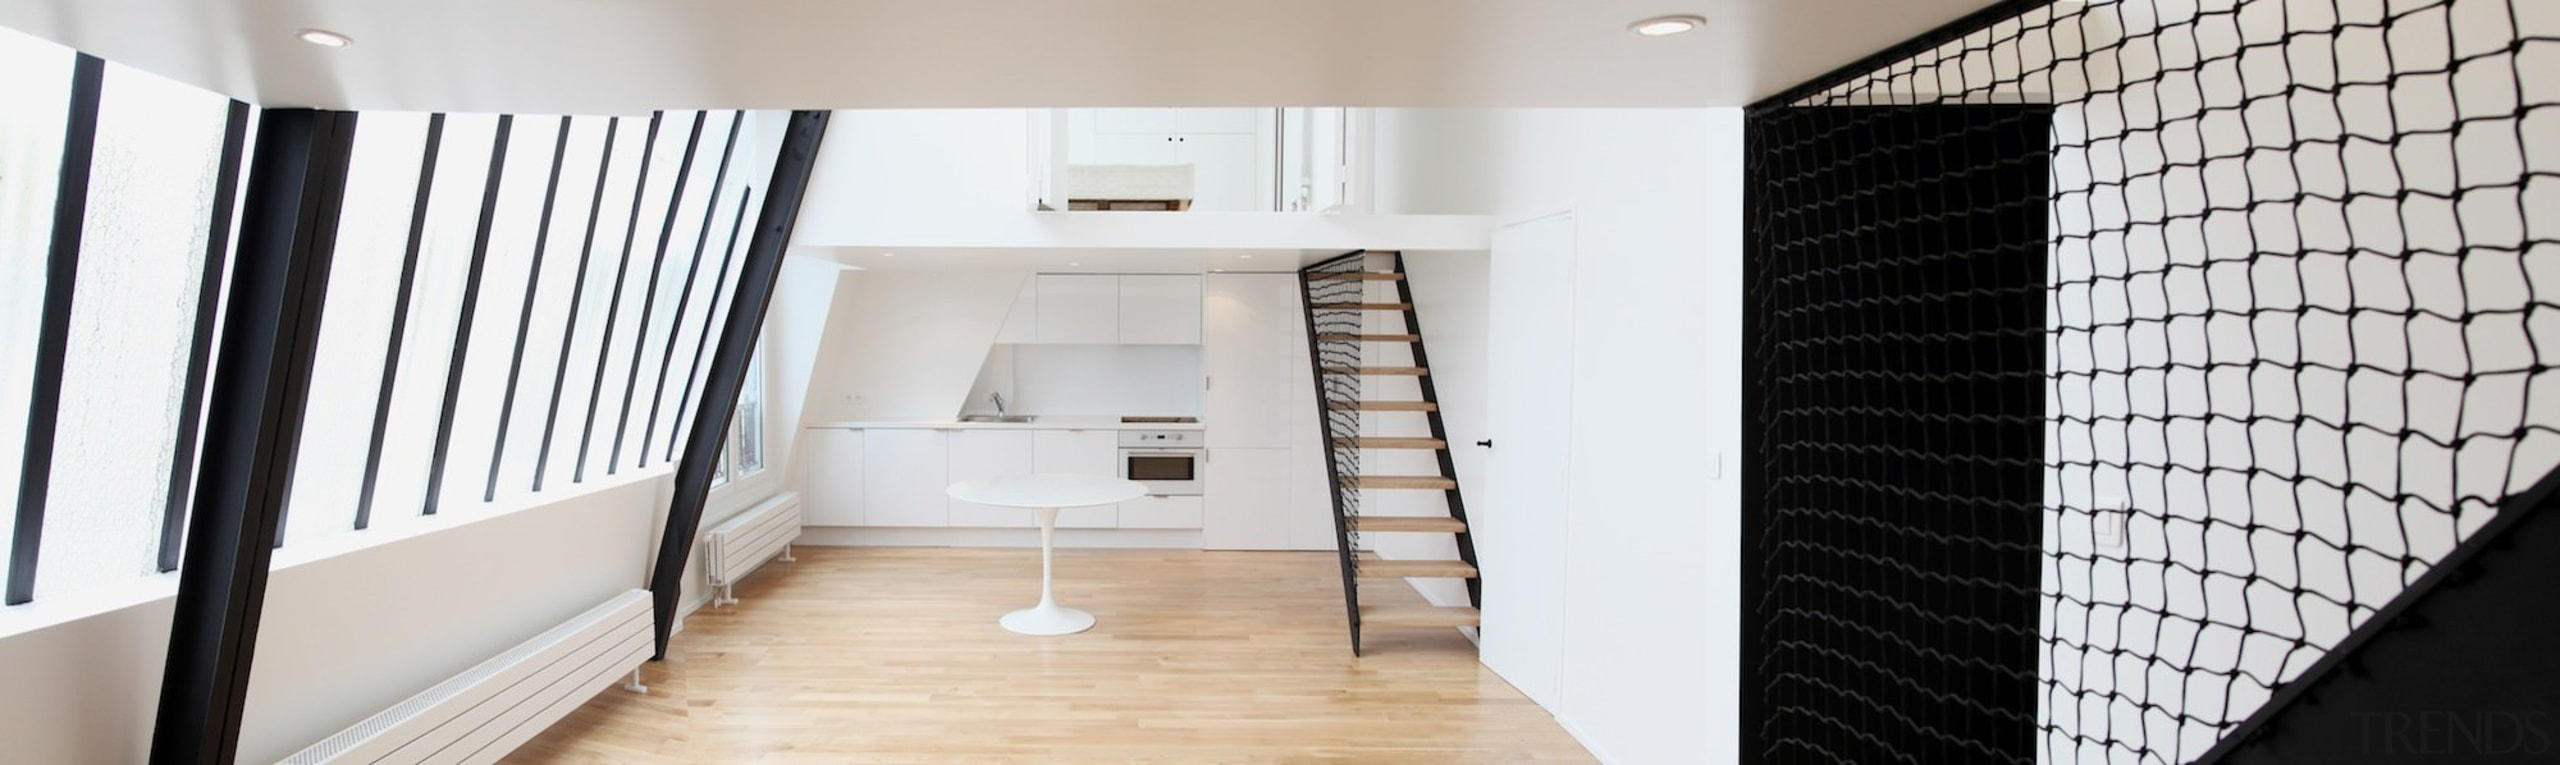 Architect: jbmn architectesPhotographer: Hermann Wendler architecture, daylighting, floor, flooring, home, house, interior design, loft, room, gray, white